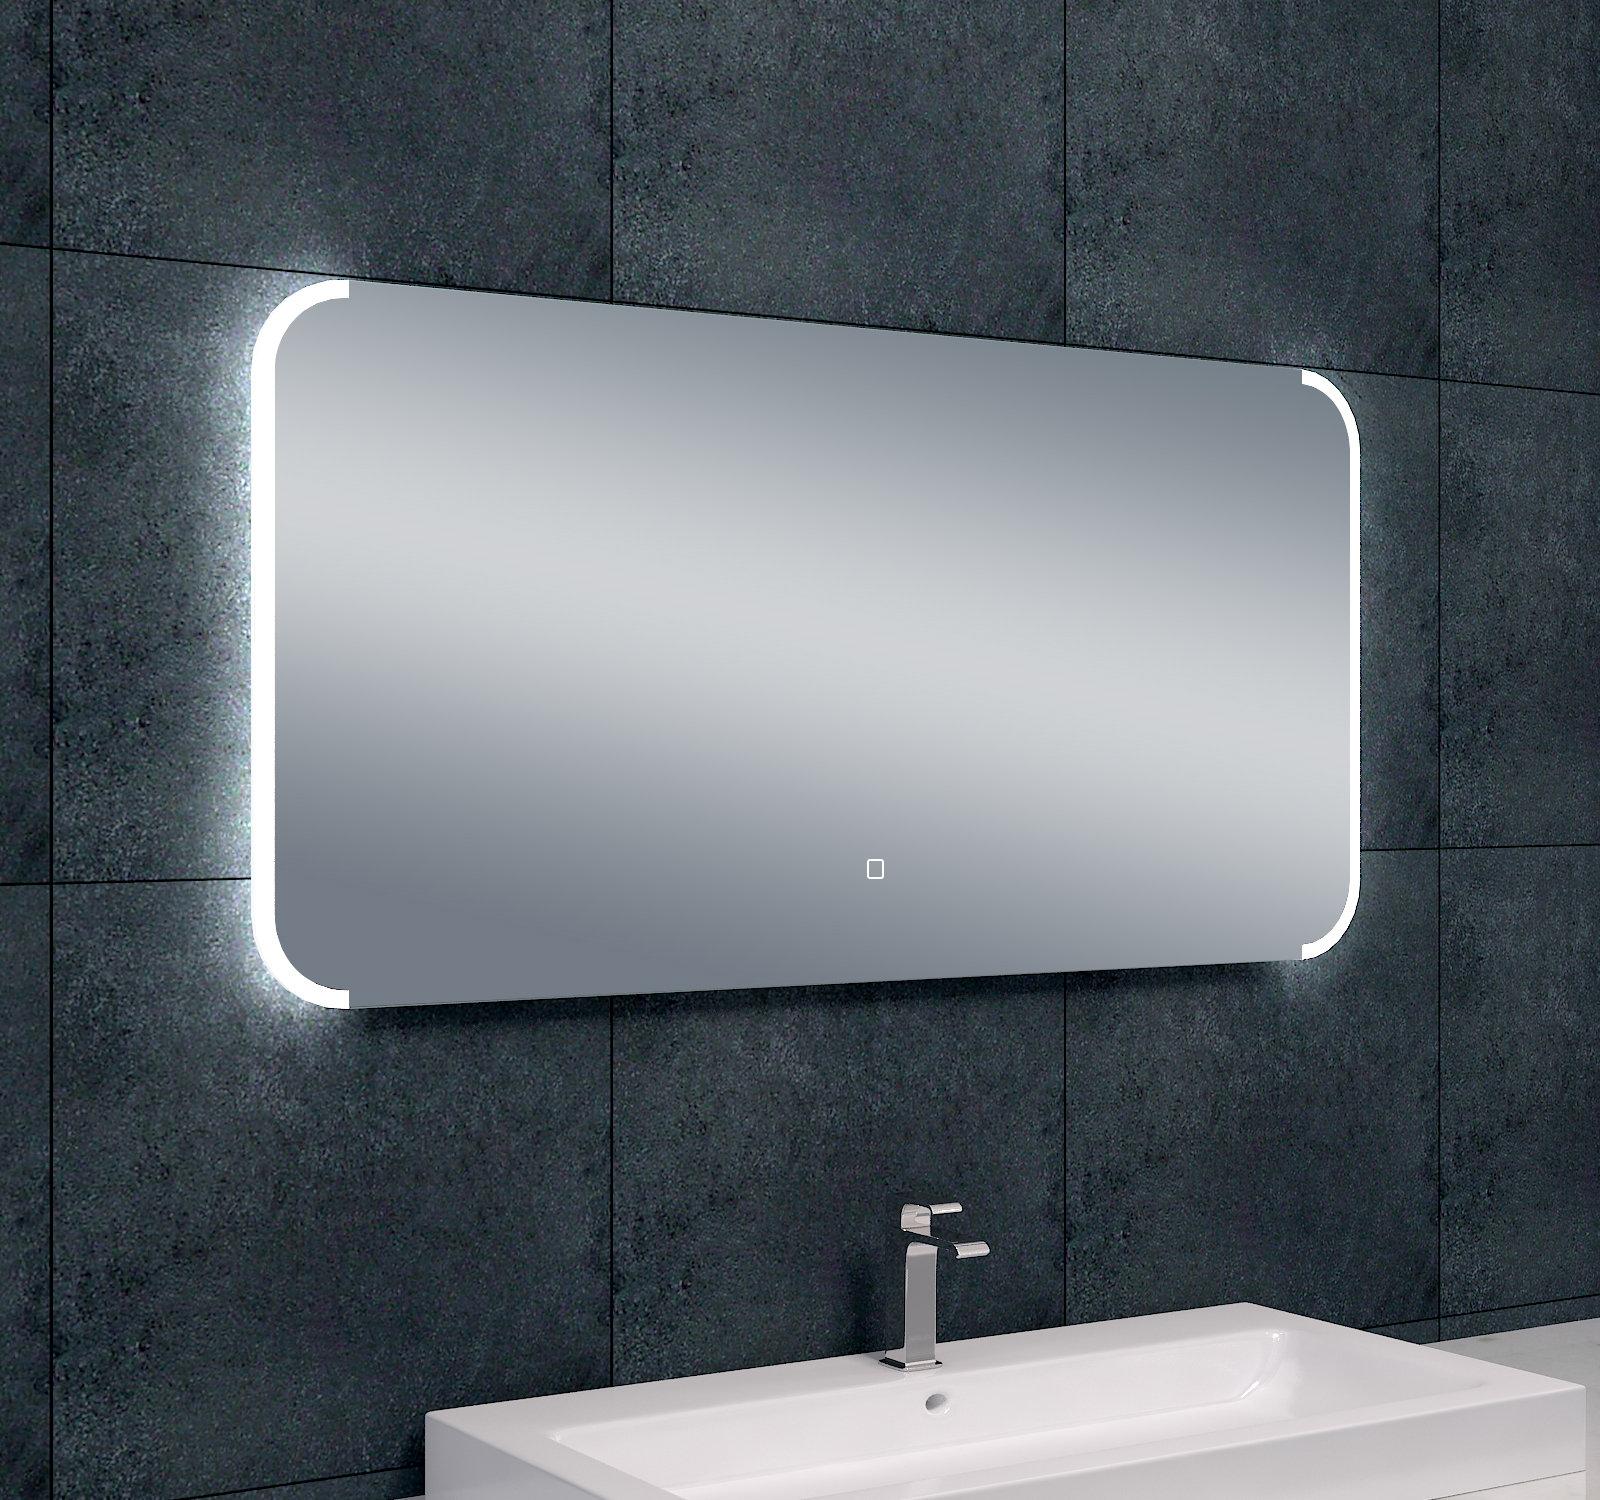 Arcon Dimbare LED Badkamerspiegel B.120 x H.60 cm